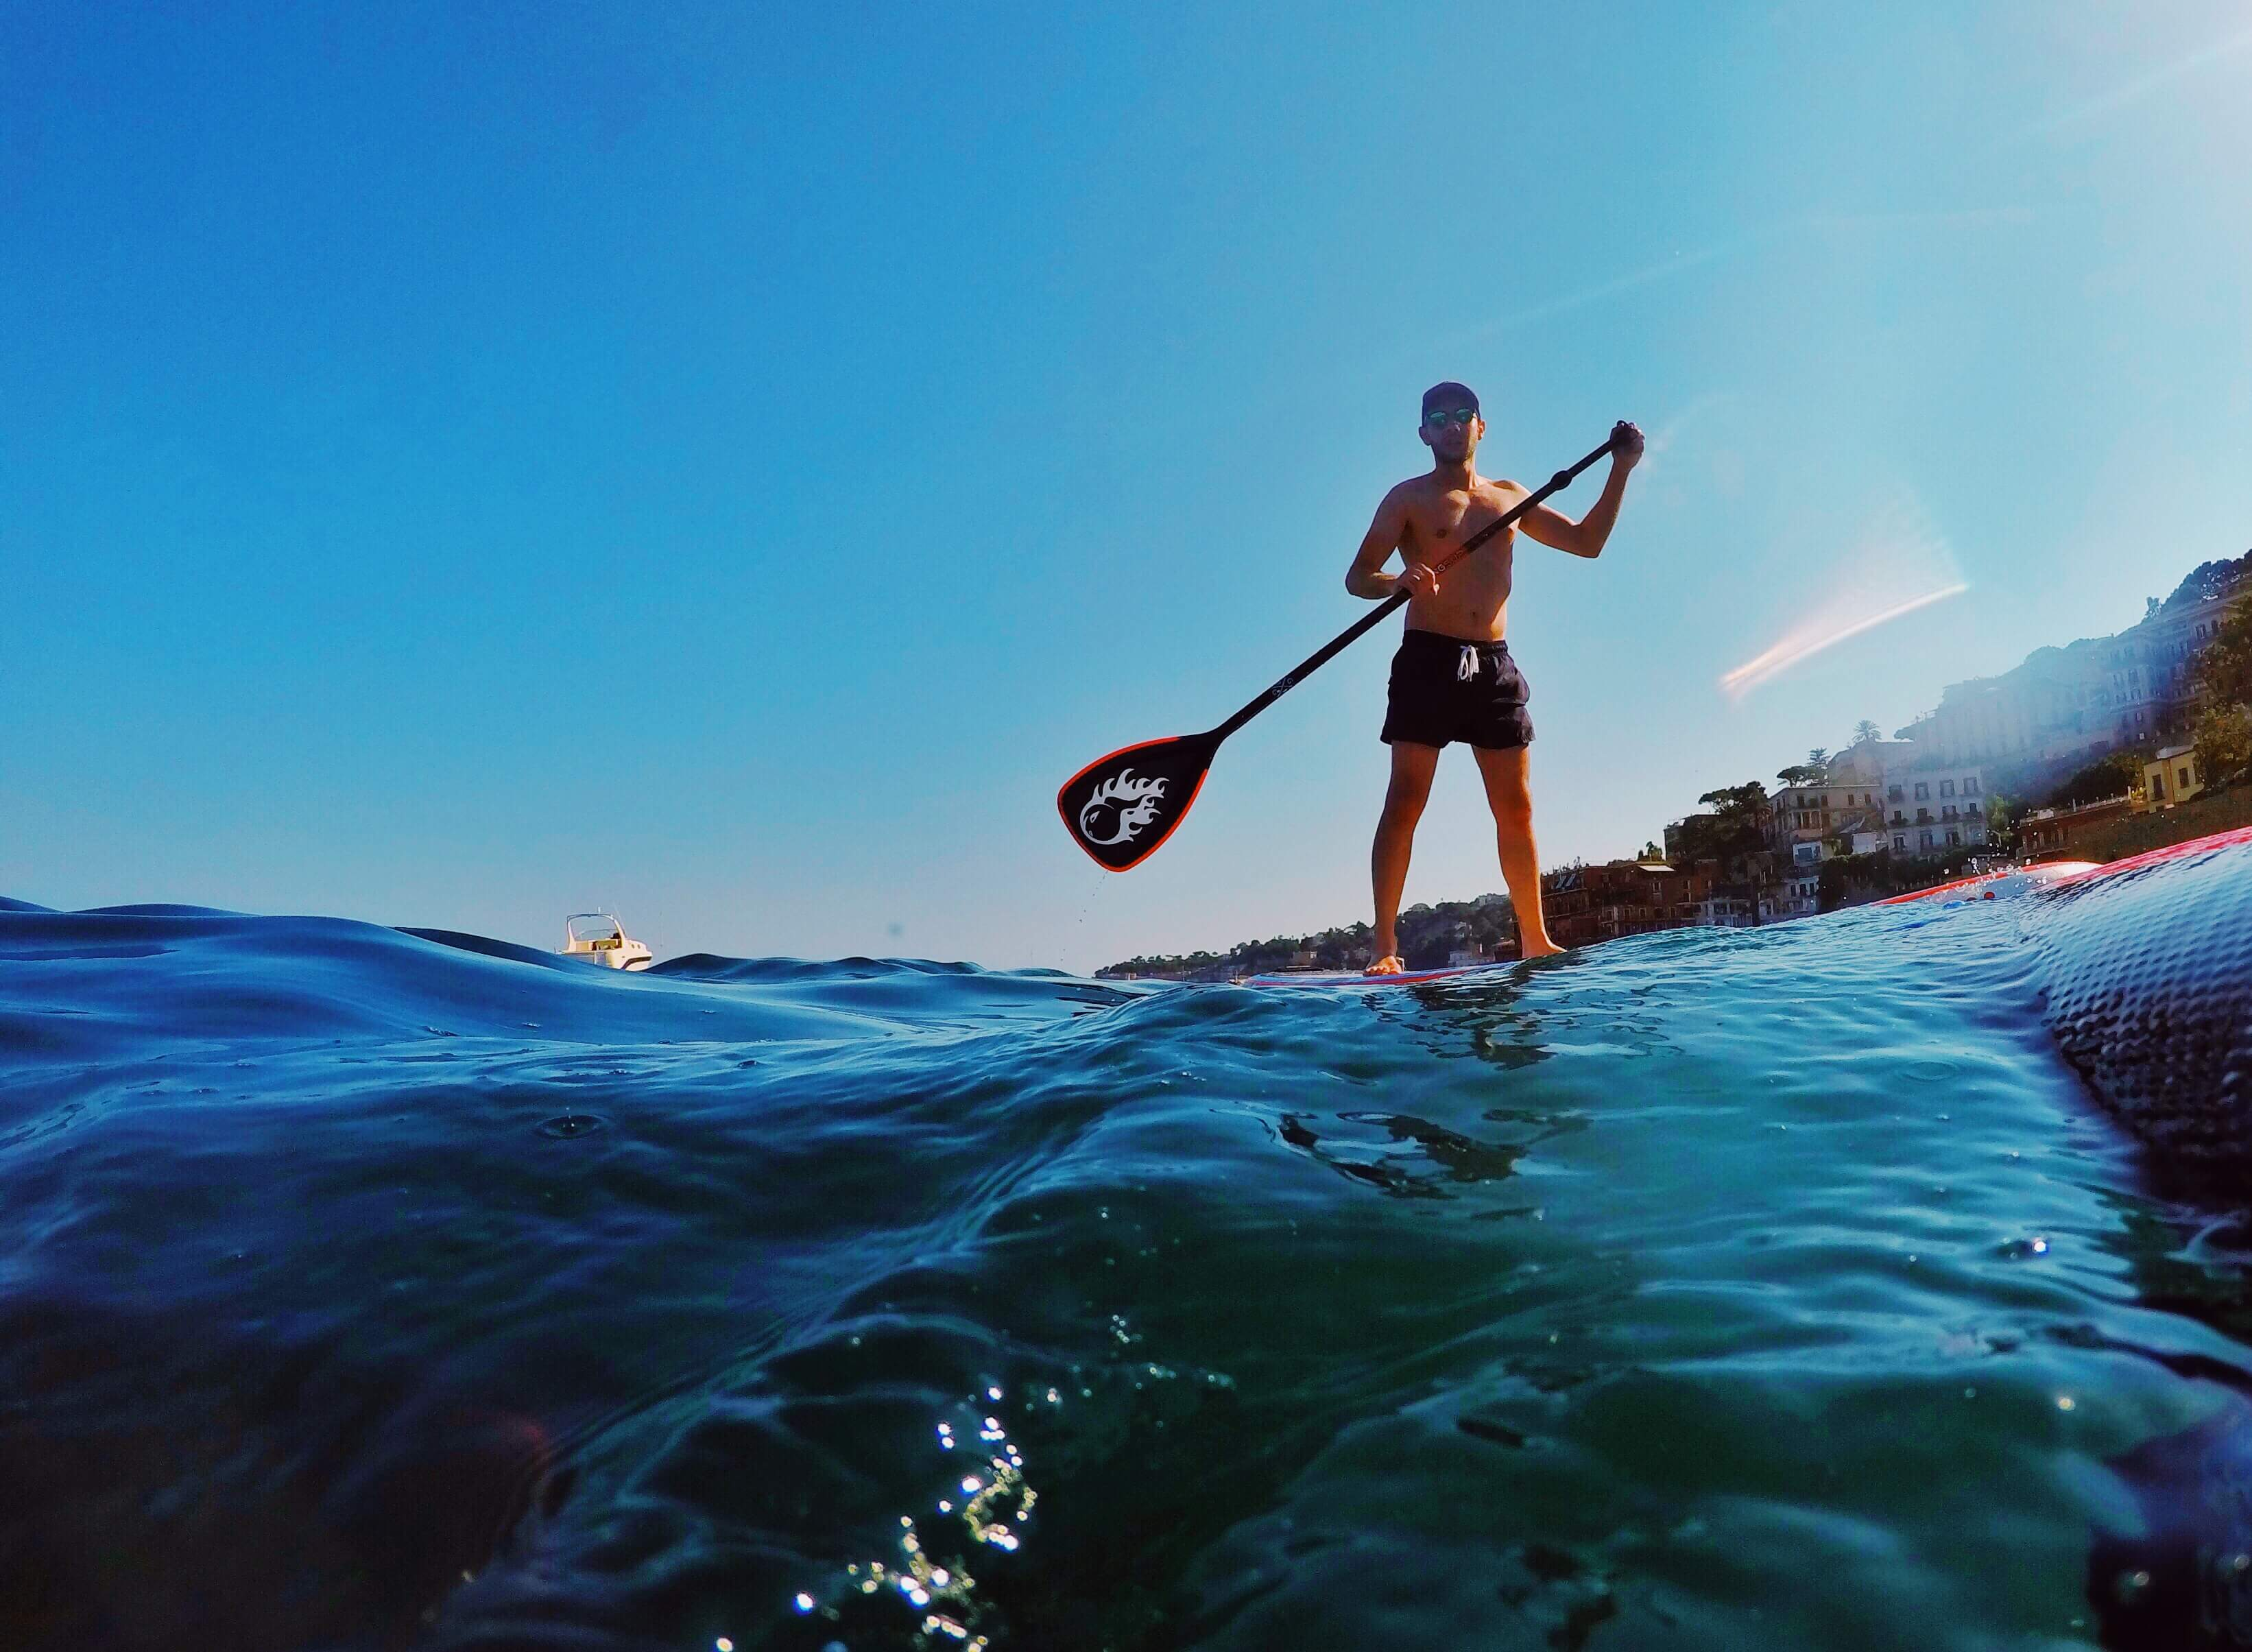 napoli stand up paddling